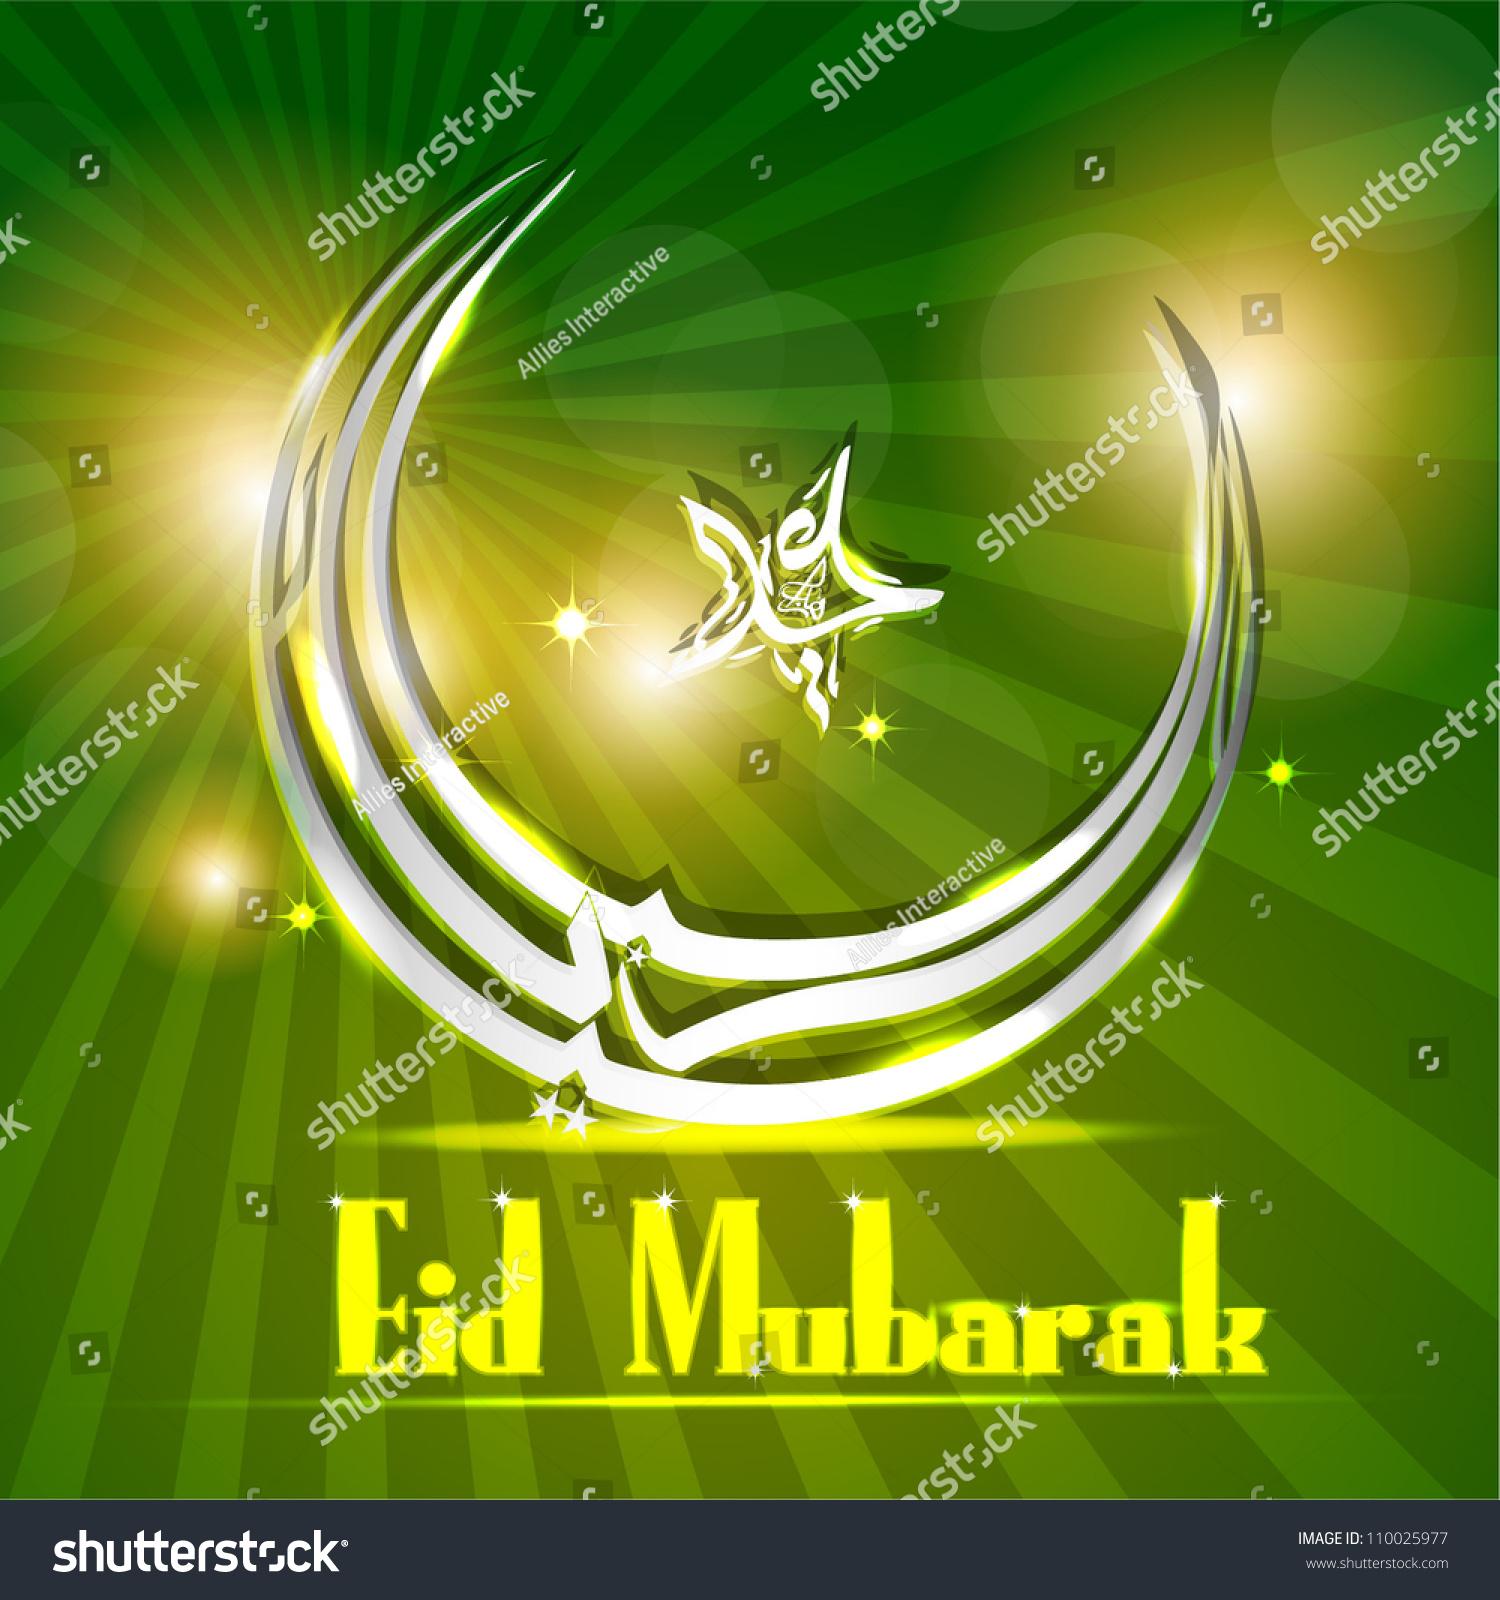 beautiful eid mubarak greeting card with shiny silver moon